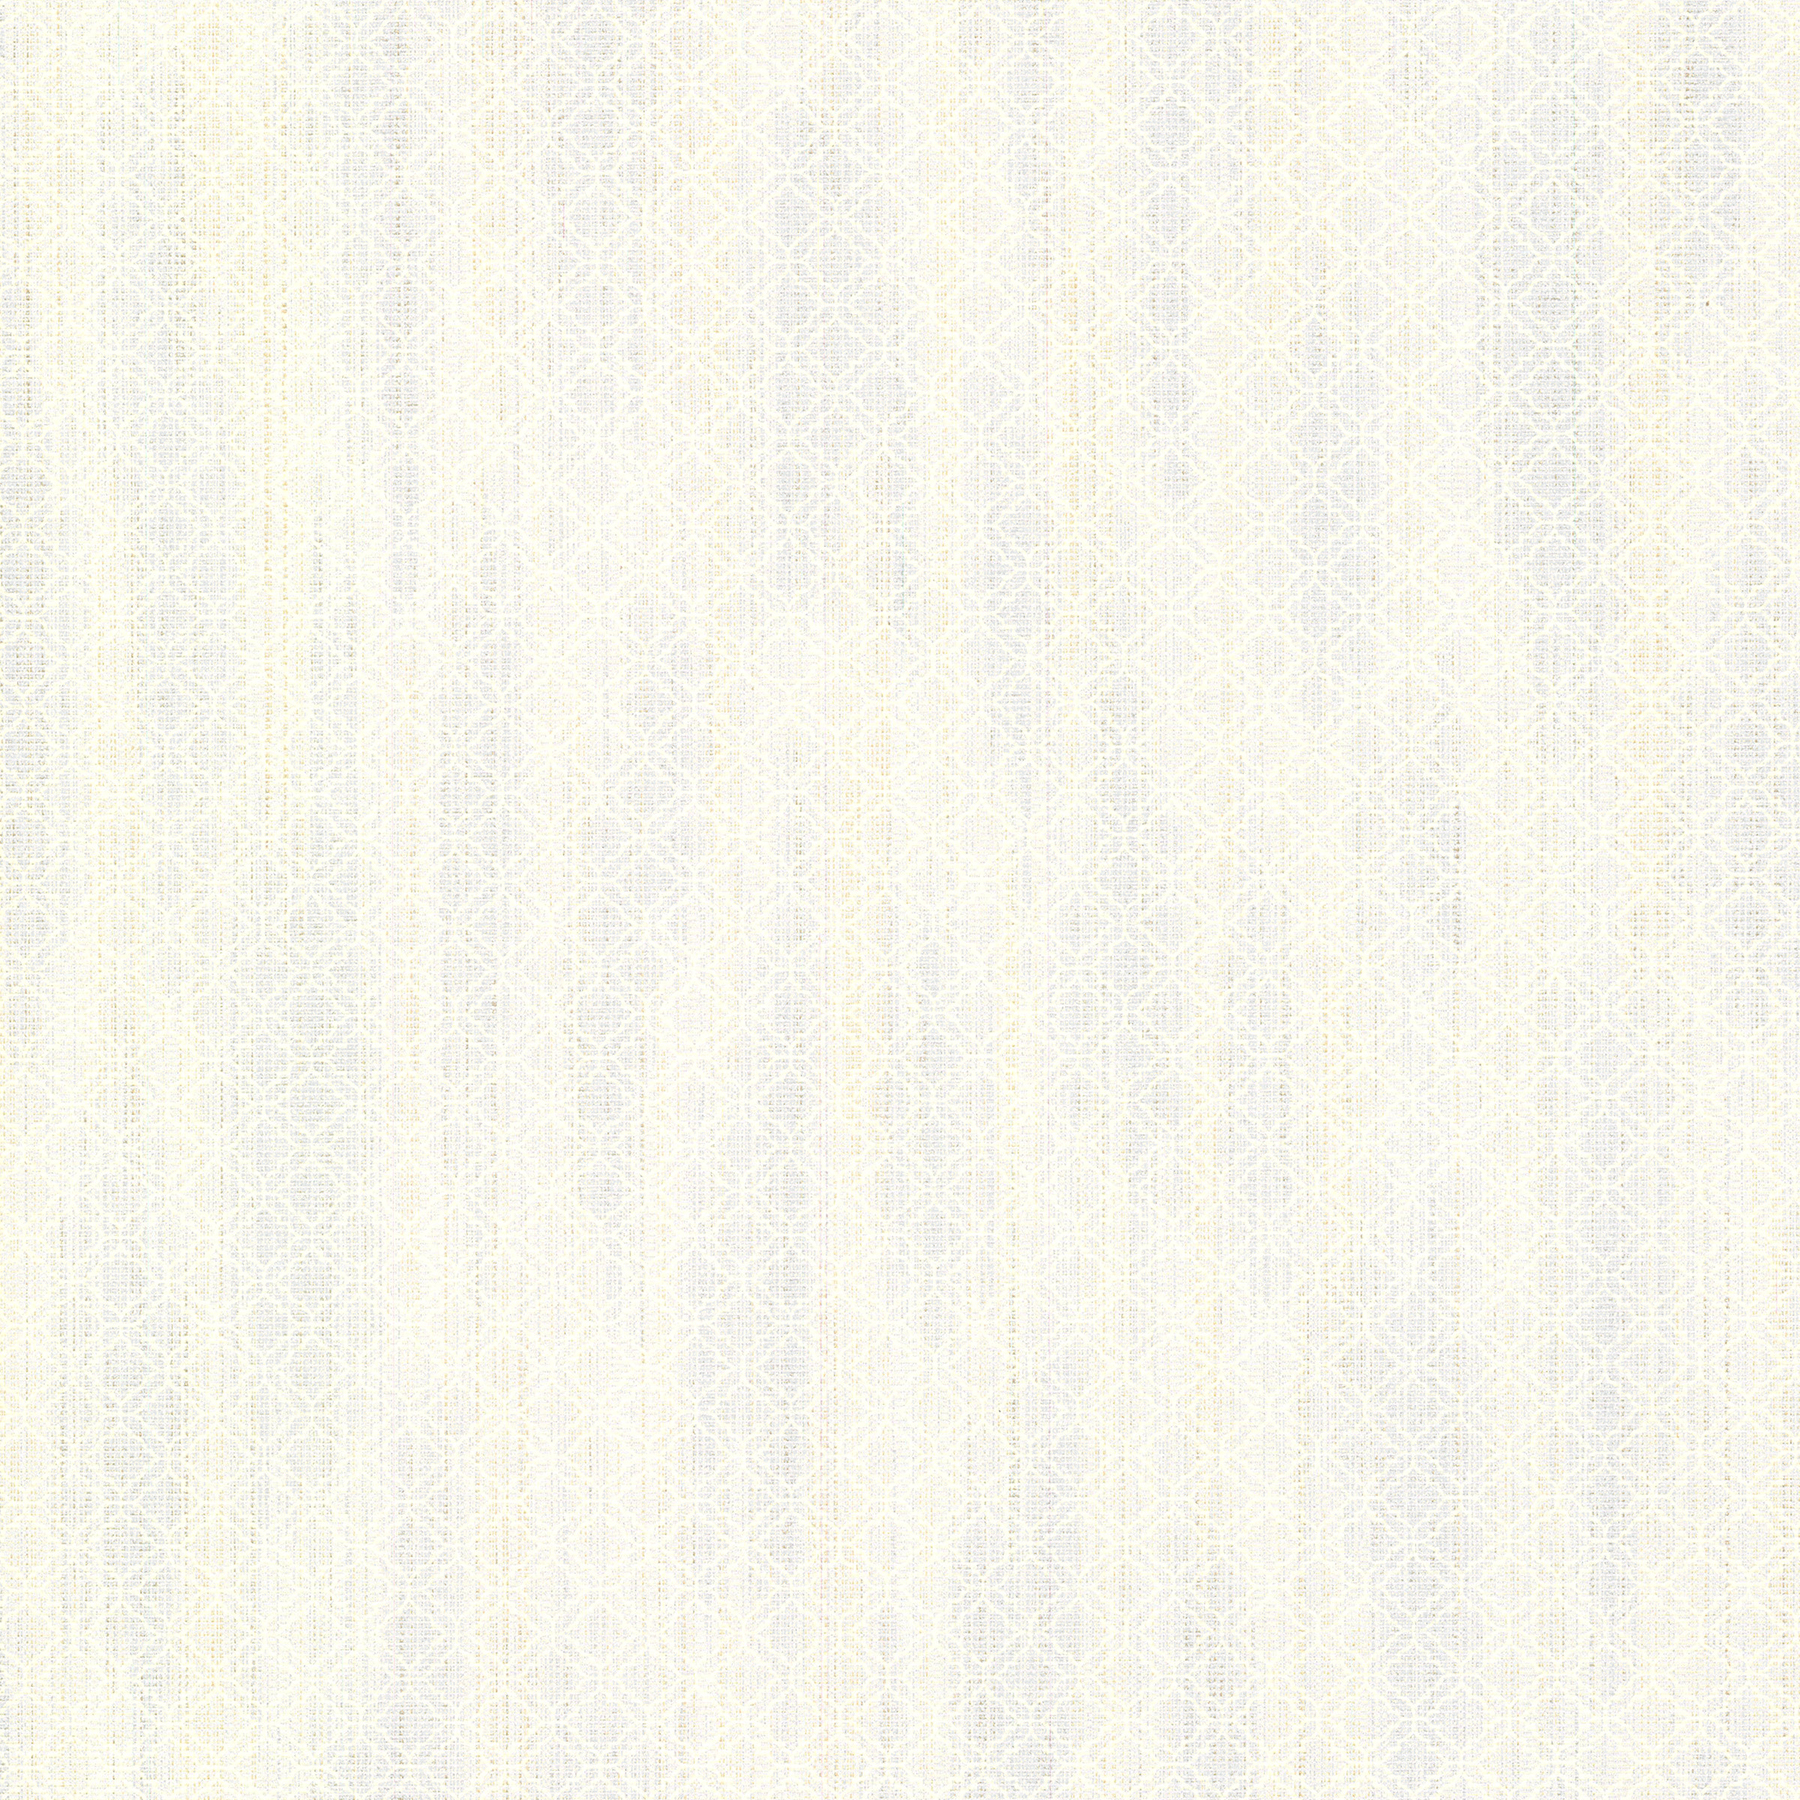 Picture of Berkeley Cream Trellis Wallpaper